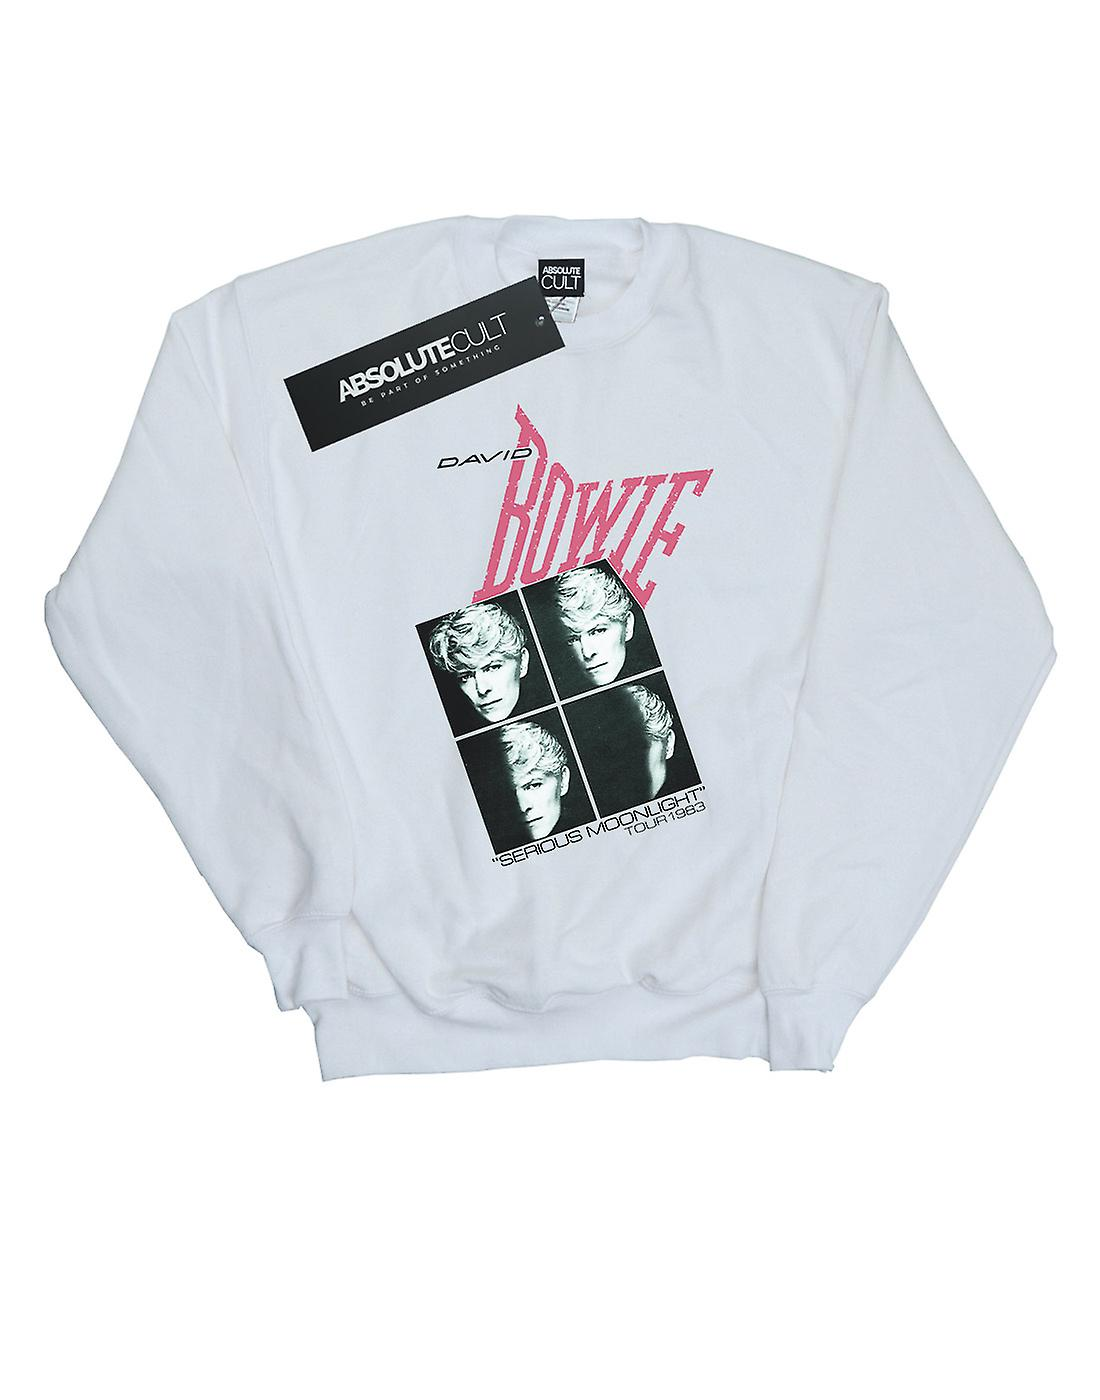 David Bowie Girls Serious Moonlight Tour 83 Sweatshirt